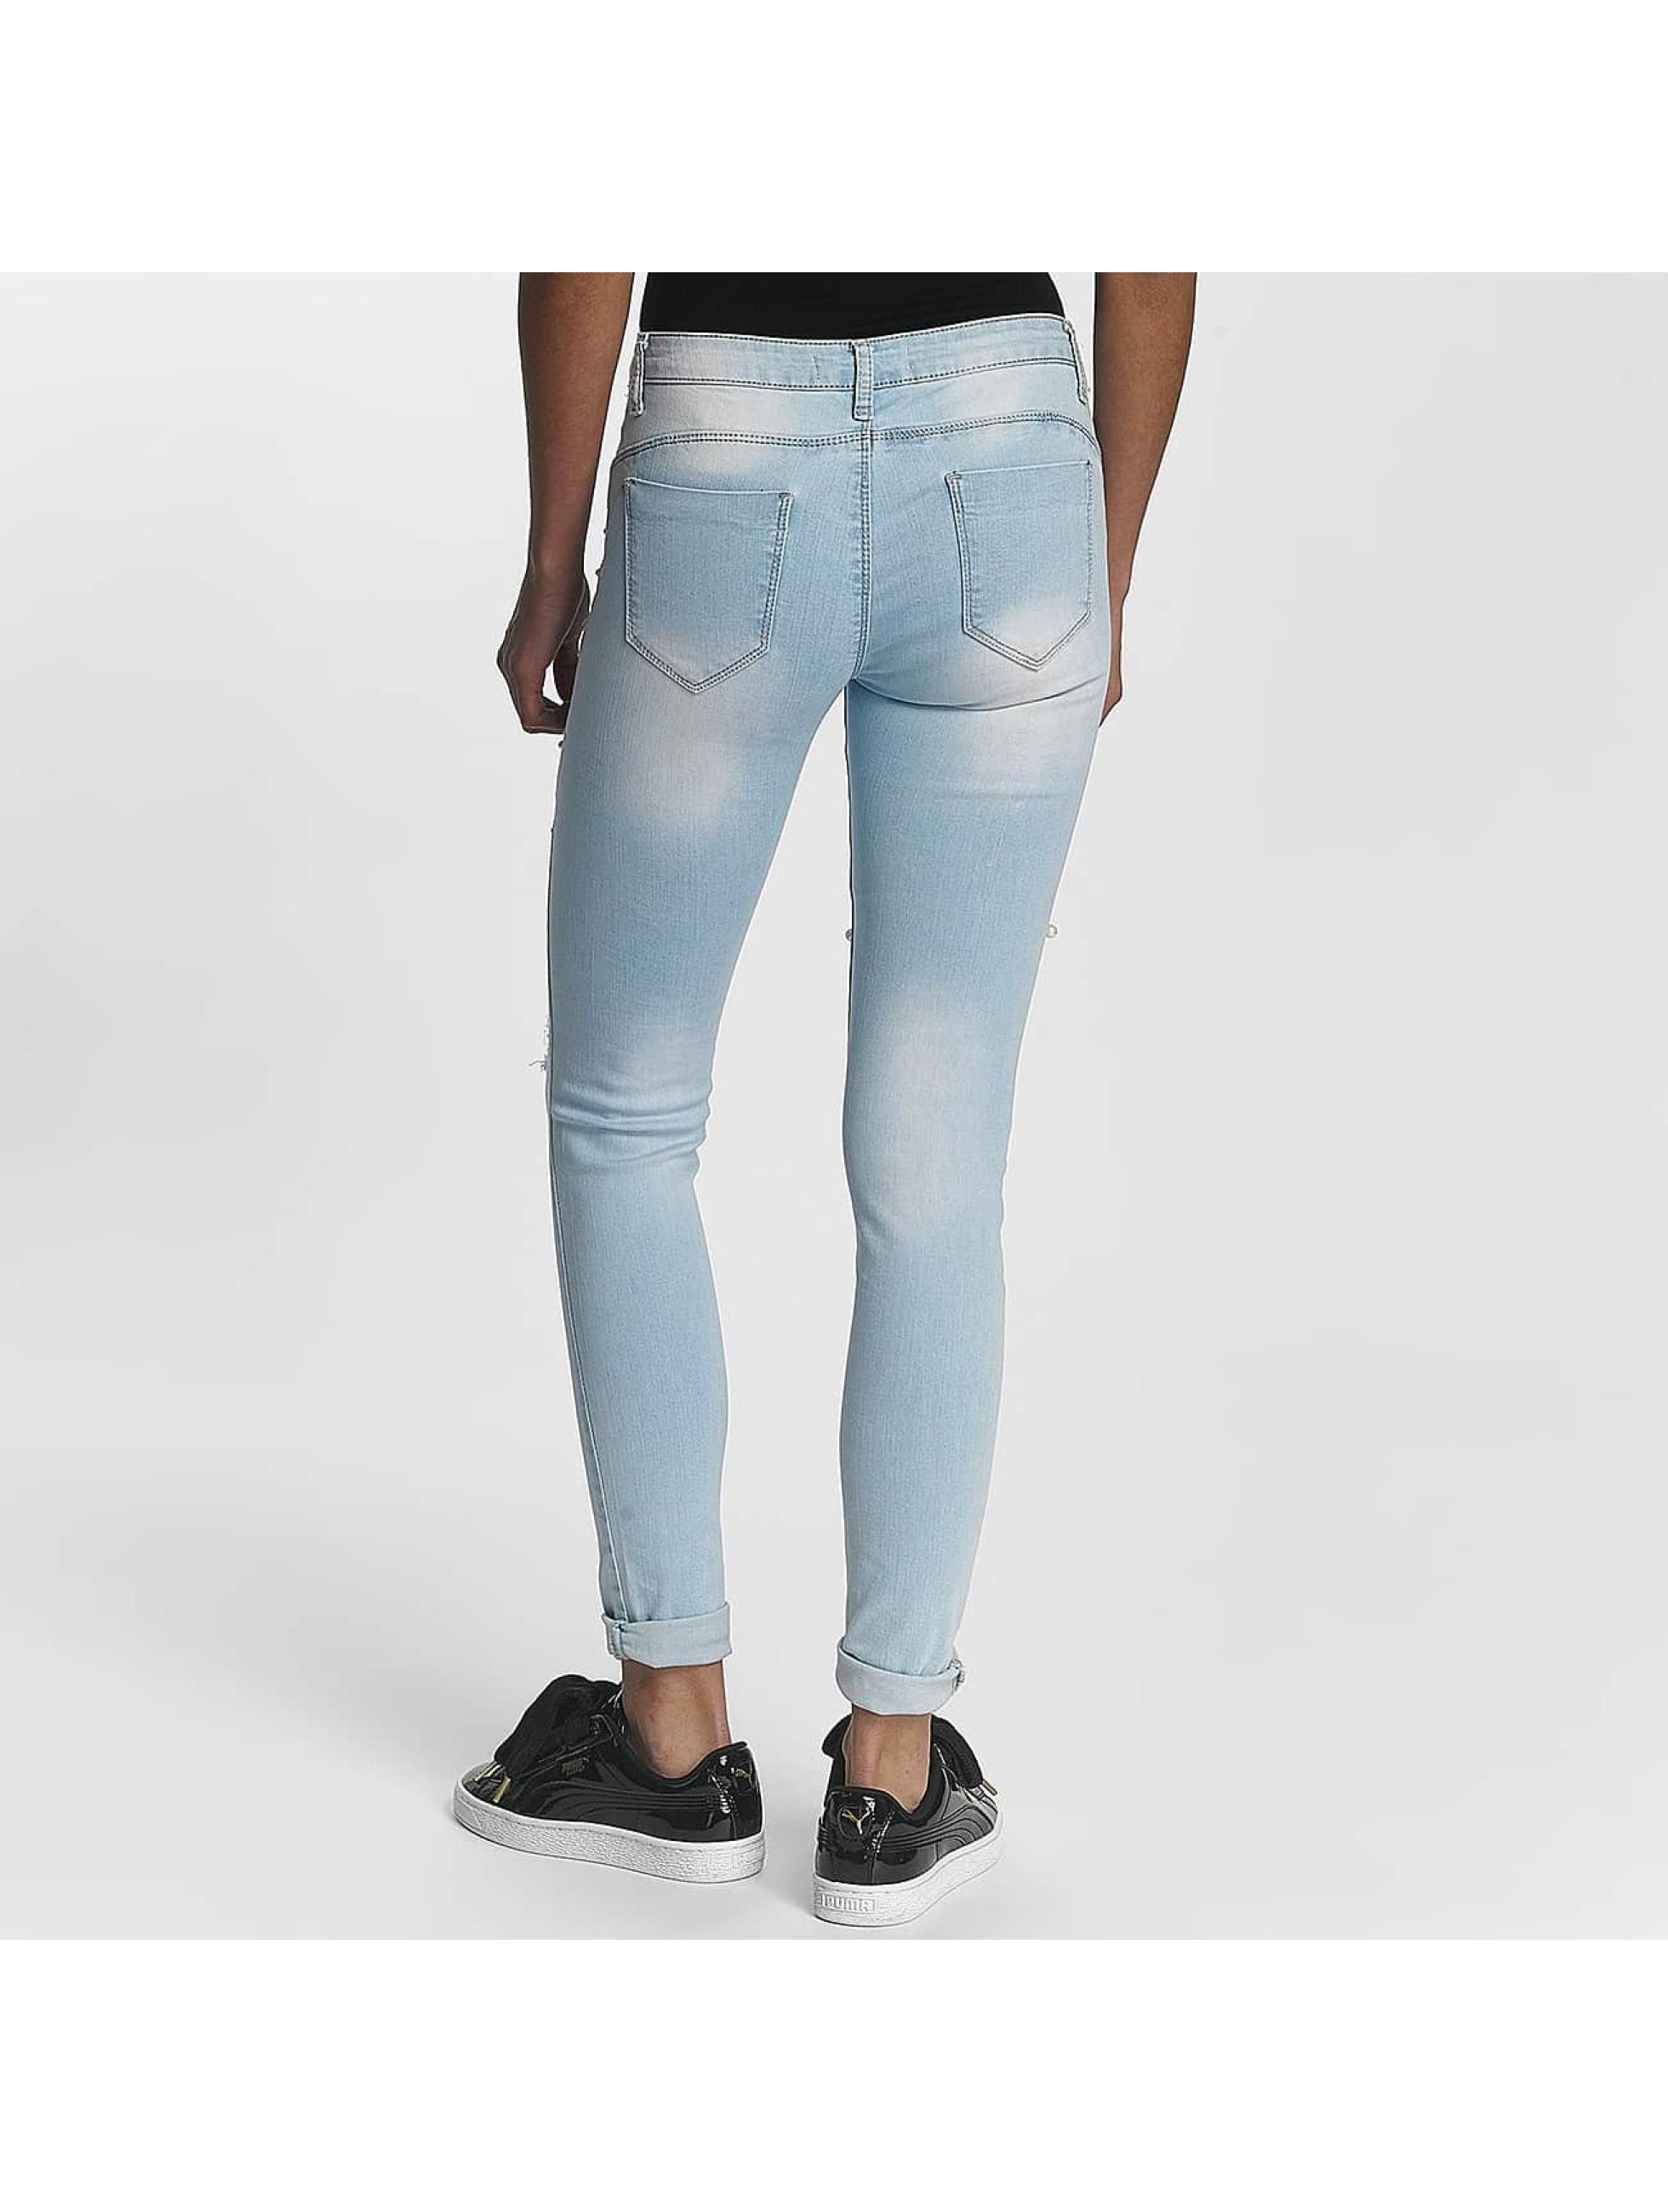 Leg Kings Облегающие джинсы Lantis синий